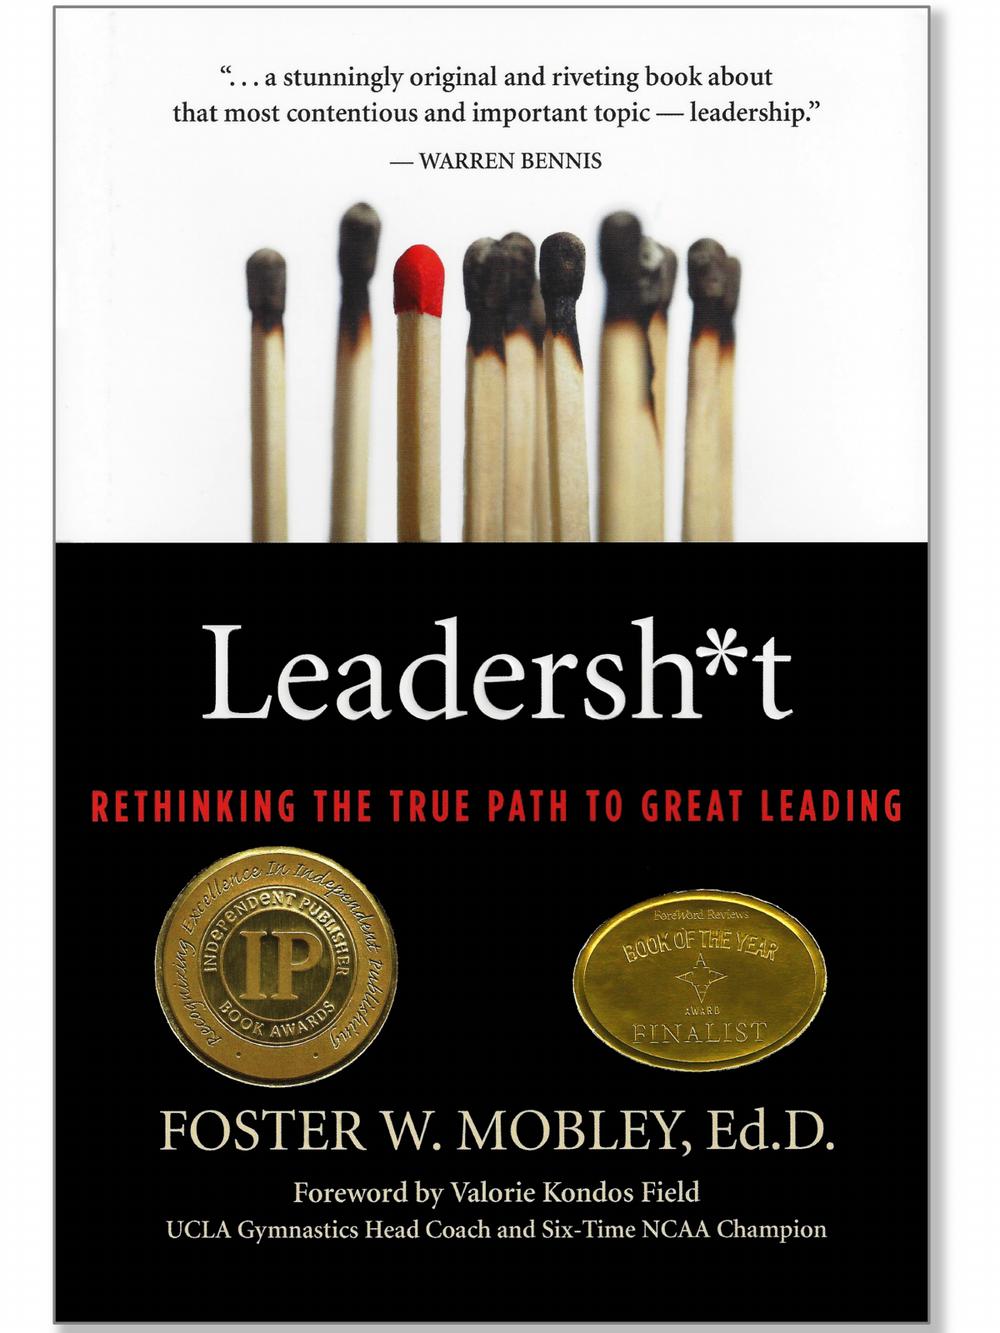 LEADERSH*T BOOK DR. FOSTER MOBLEY